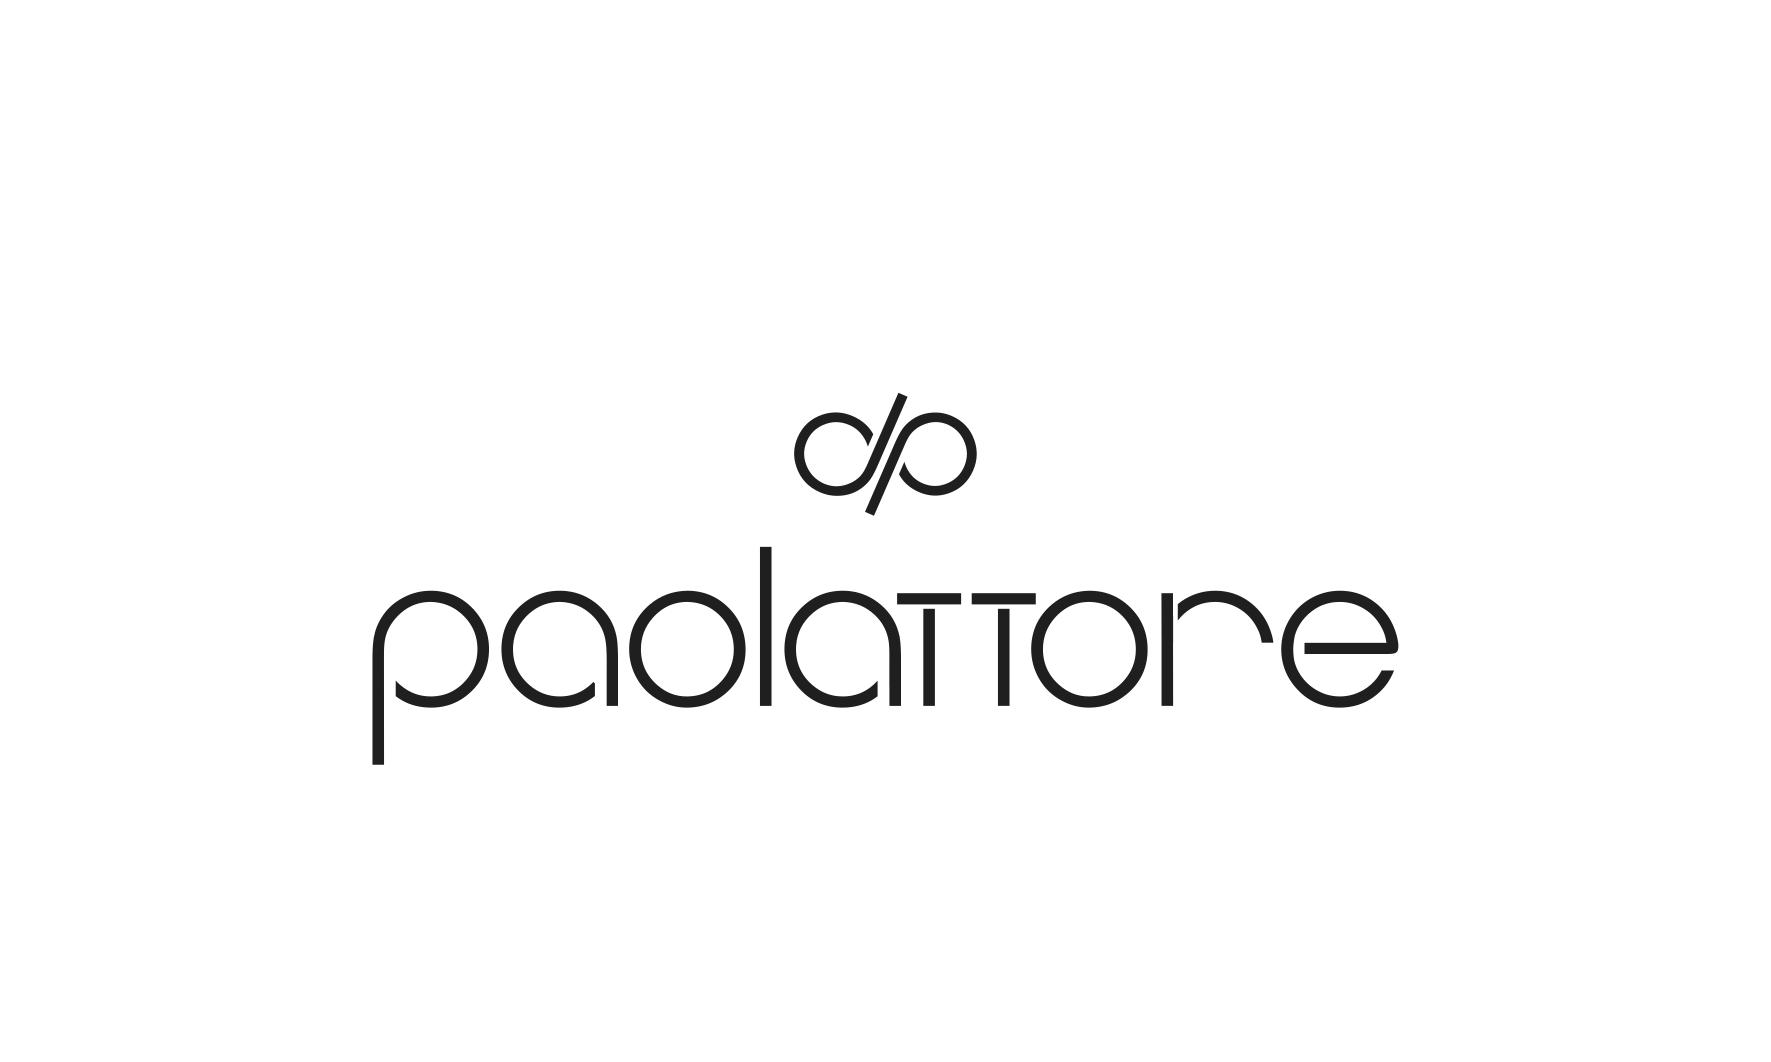 Paolattore